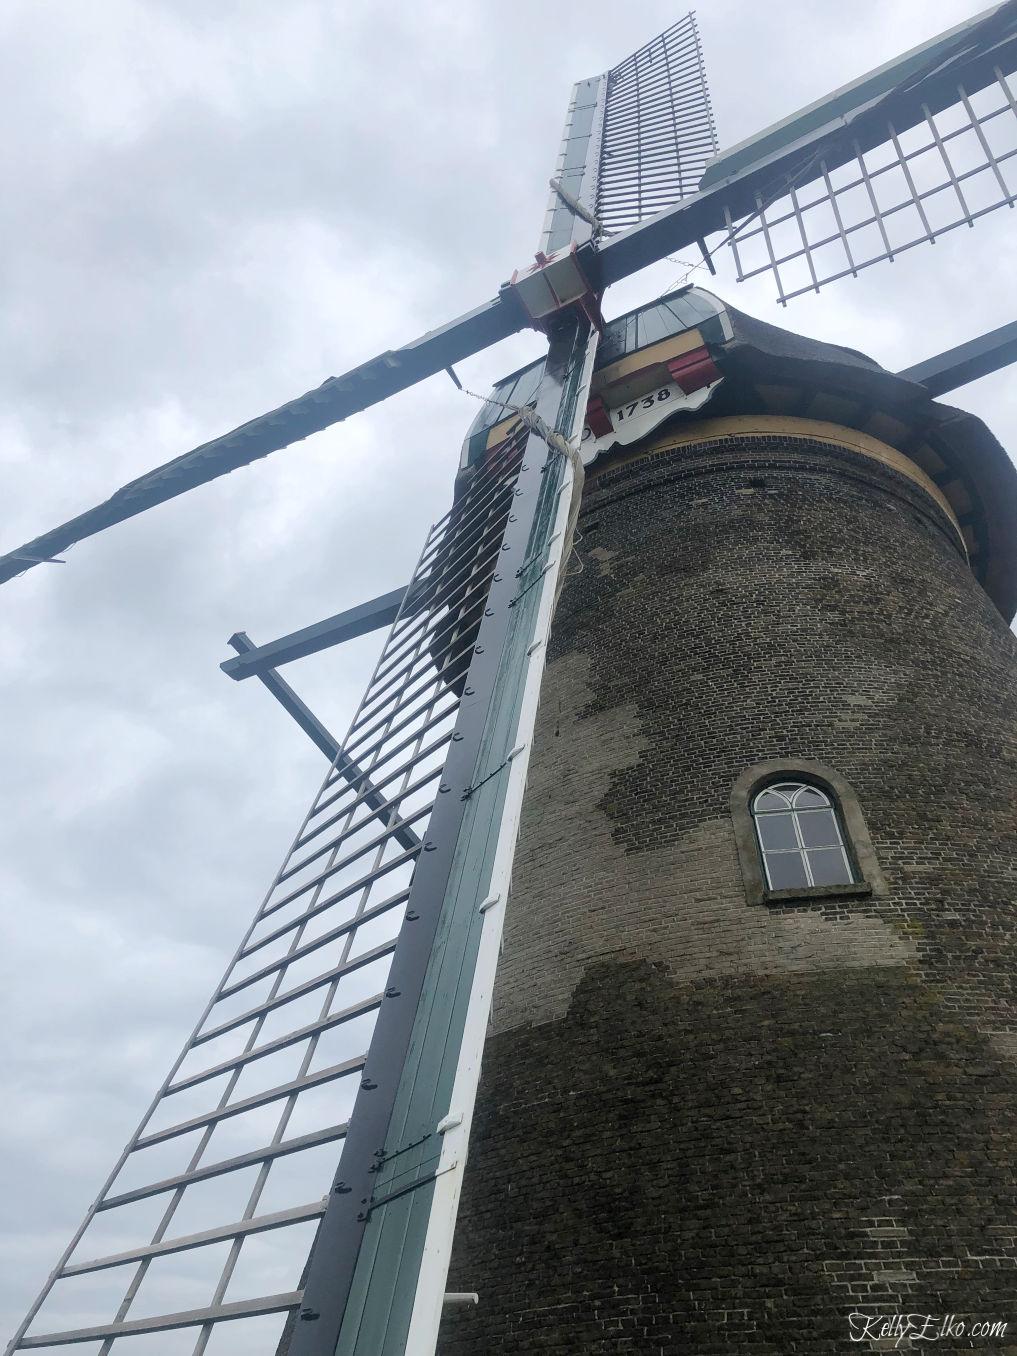 A working windmill in Kinderdijk Netherlands kellyelko.com #kinderdijk #windmill #europe #travel #travelblogger #netherlands